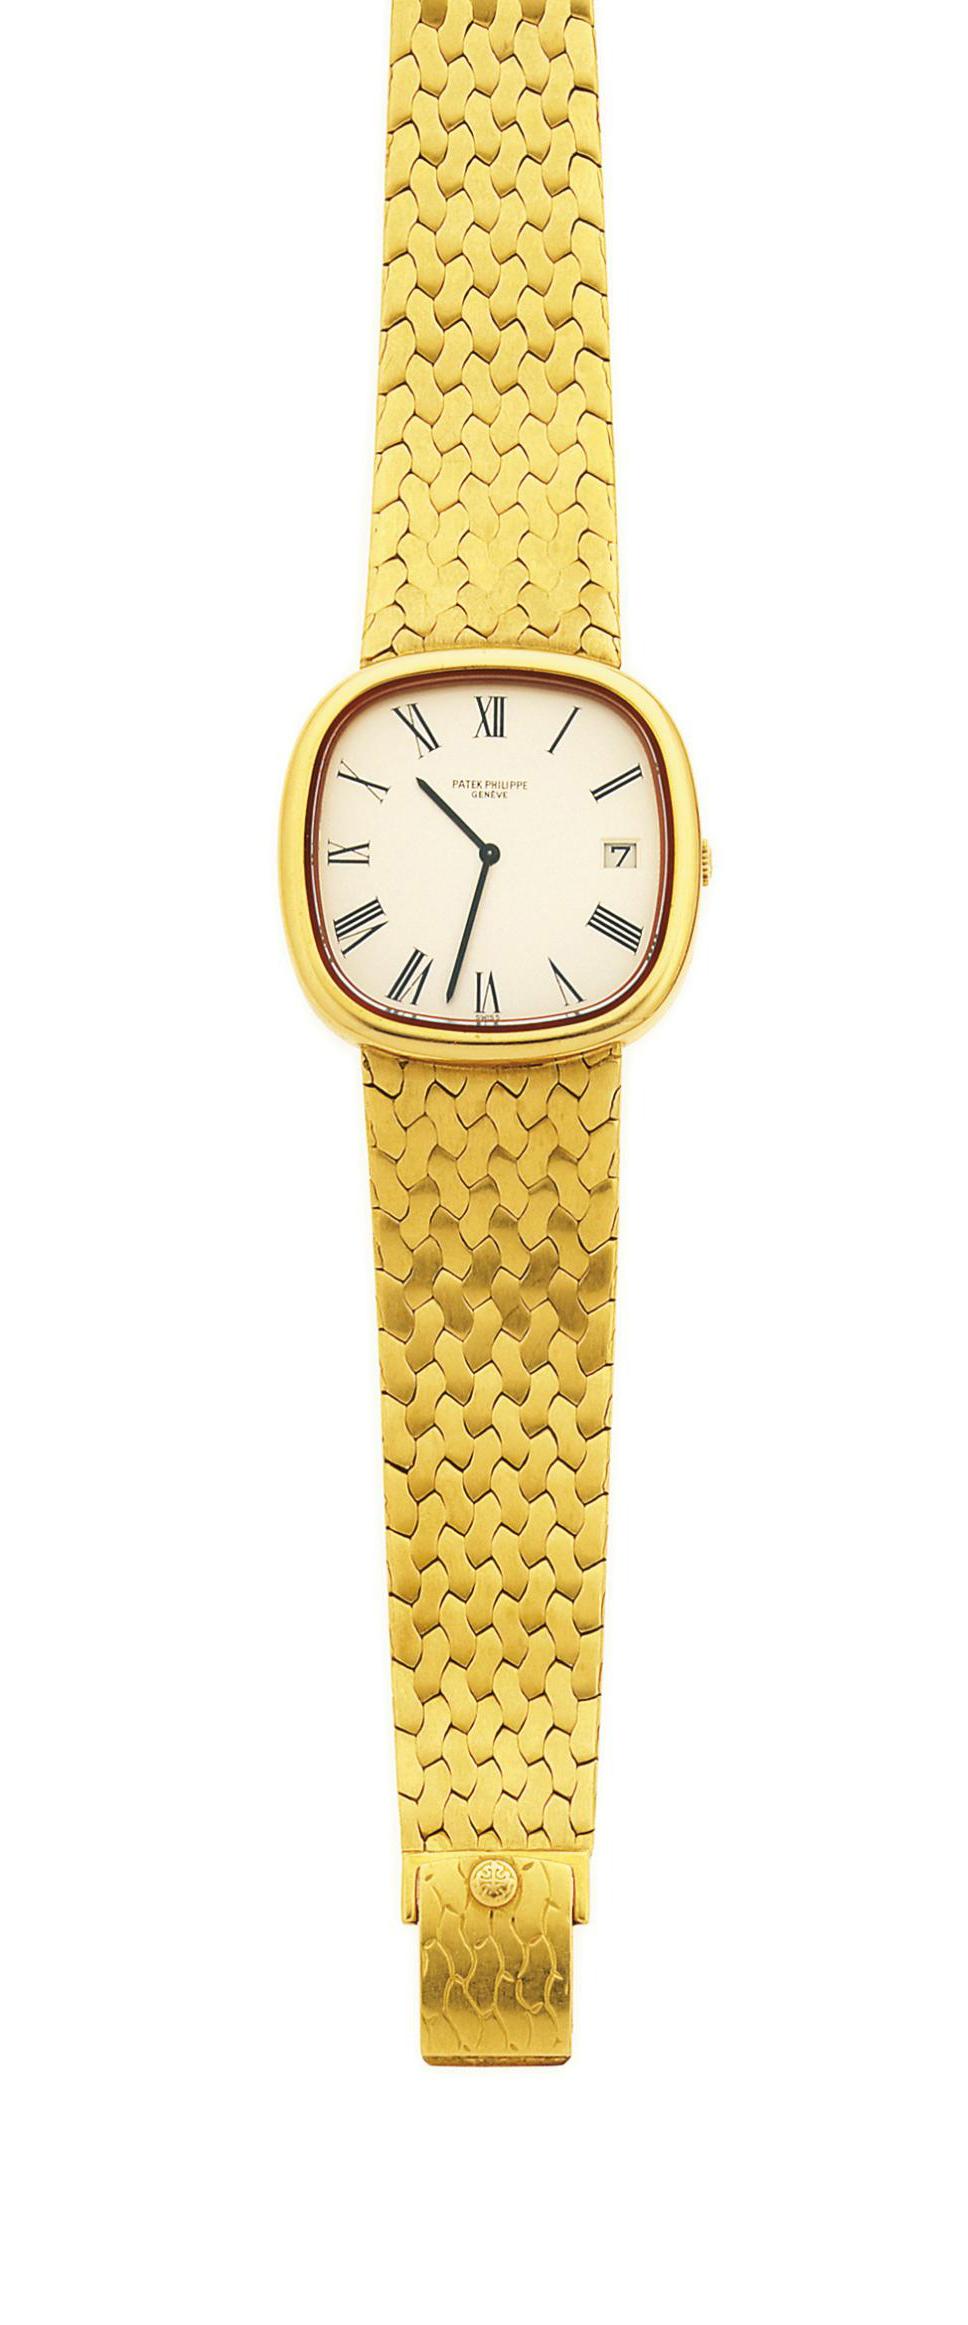 A wristwatch, by Patek Philippe